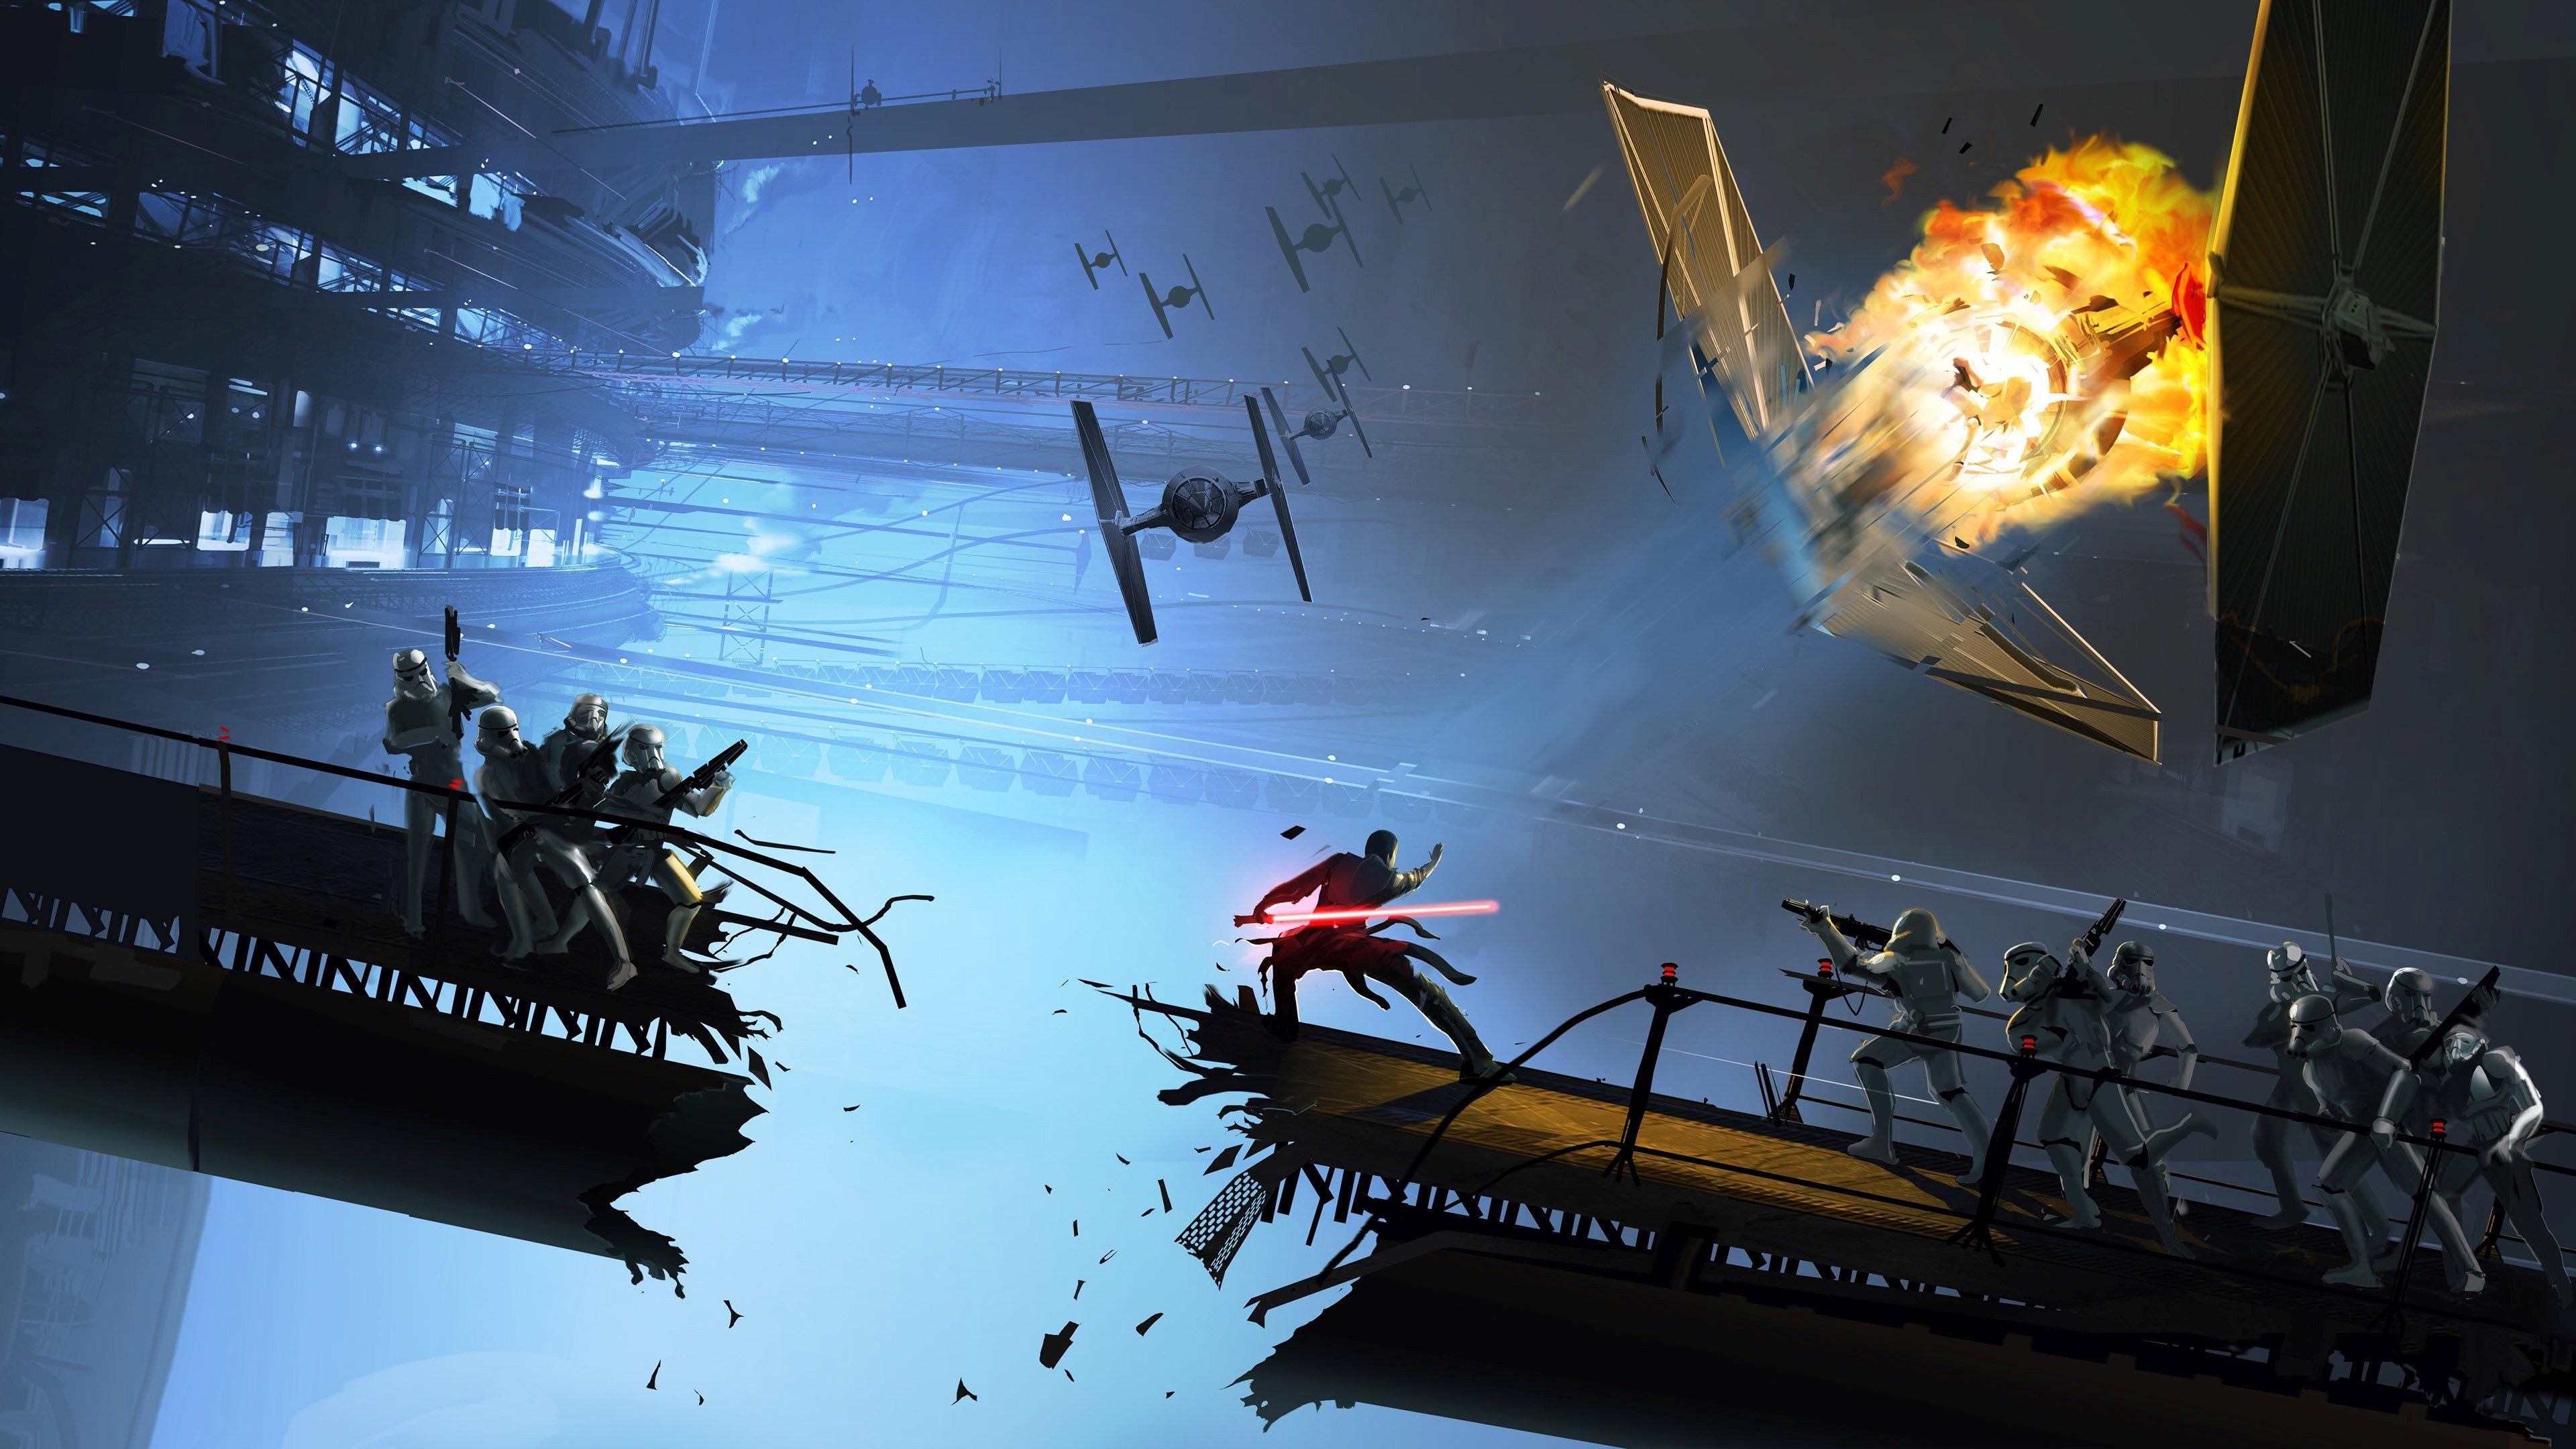 Star wars knights of the old republic hd games 4k - 4k star wars wallpaper ...